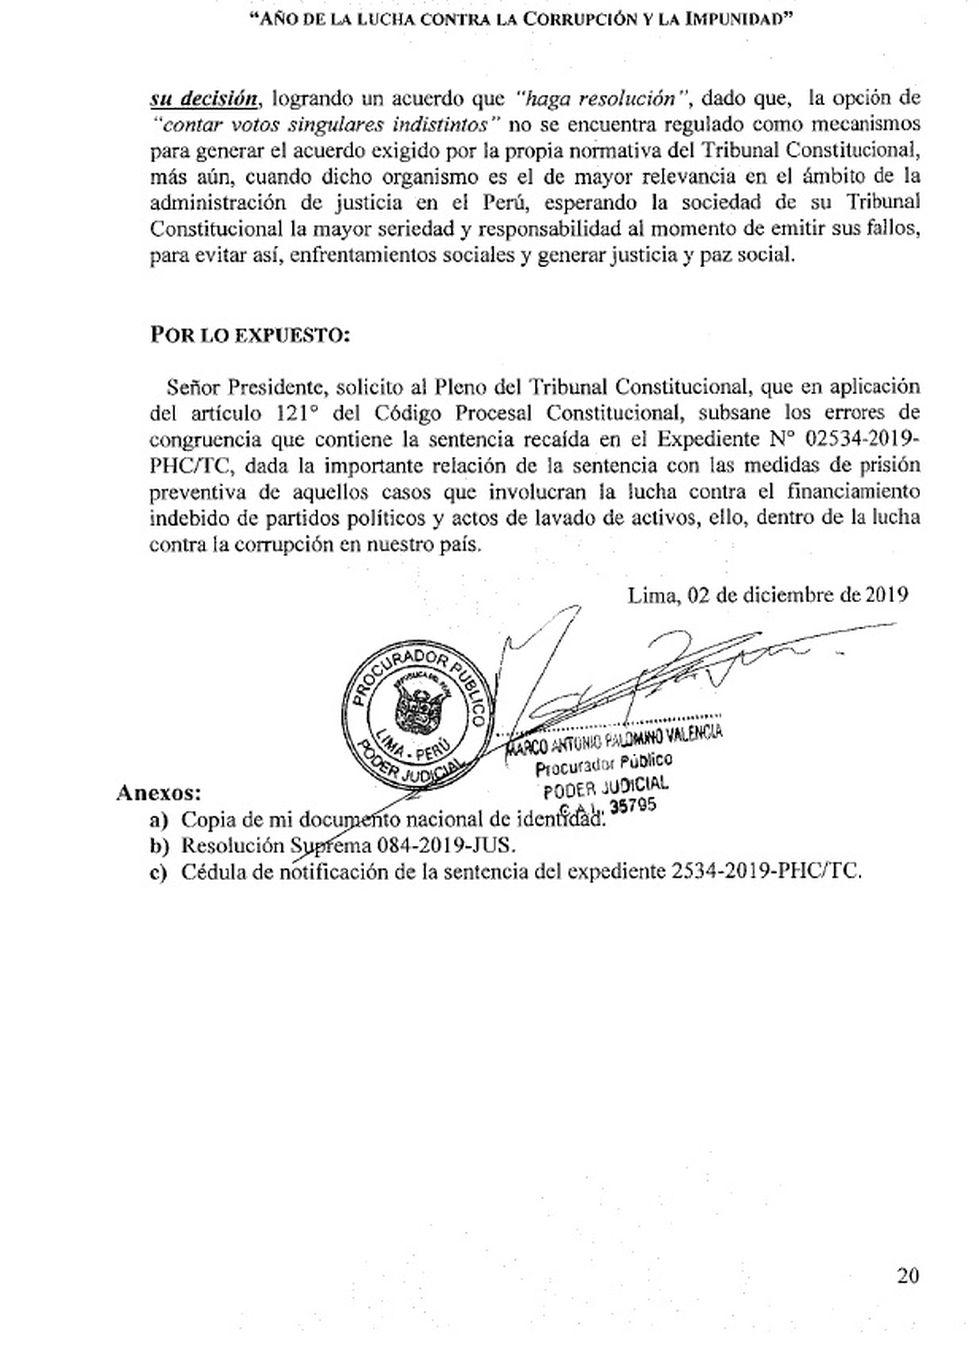 Procurador solicitó que el Tribunal Constitucional aclare fallo que liberó a Keiko Fujimori